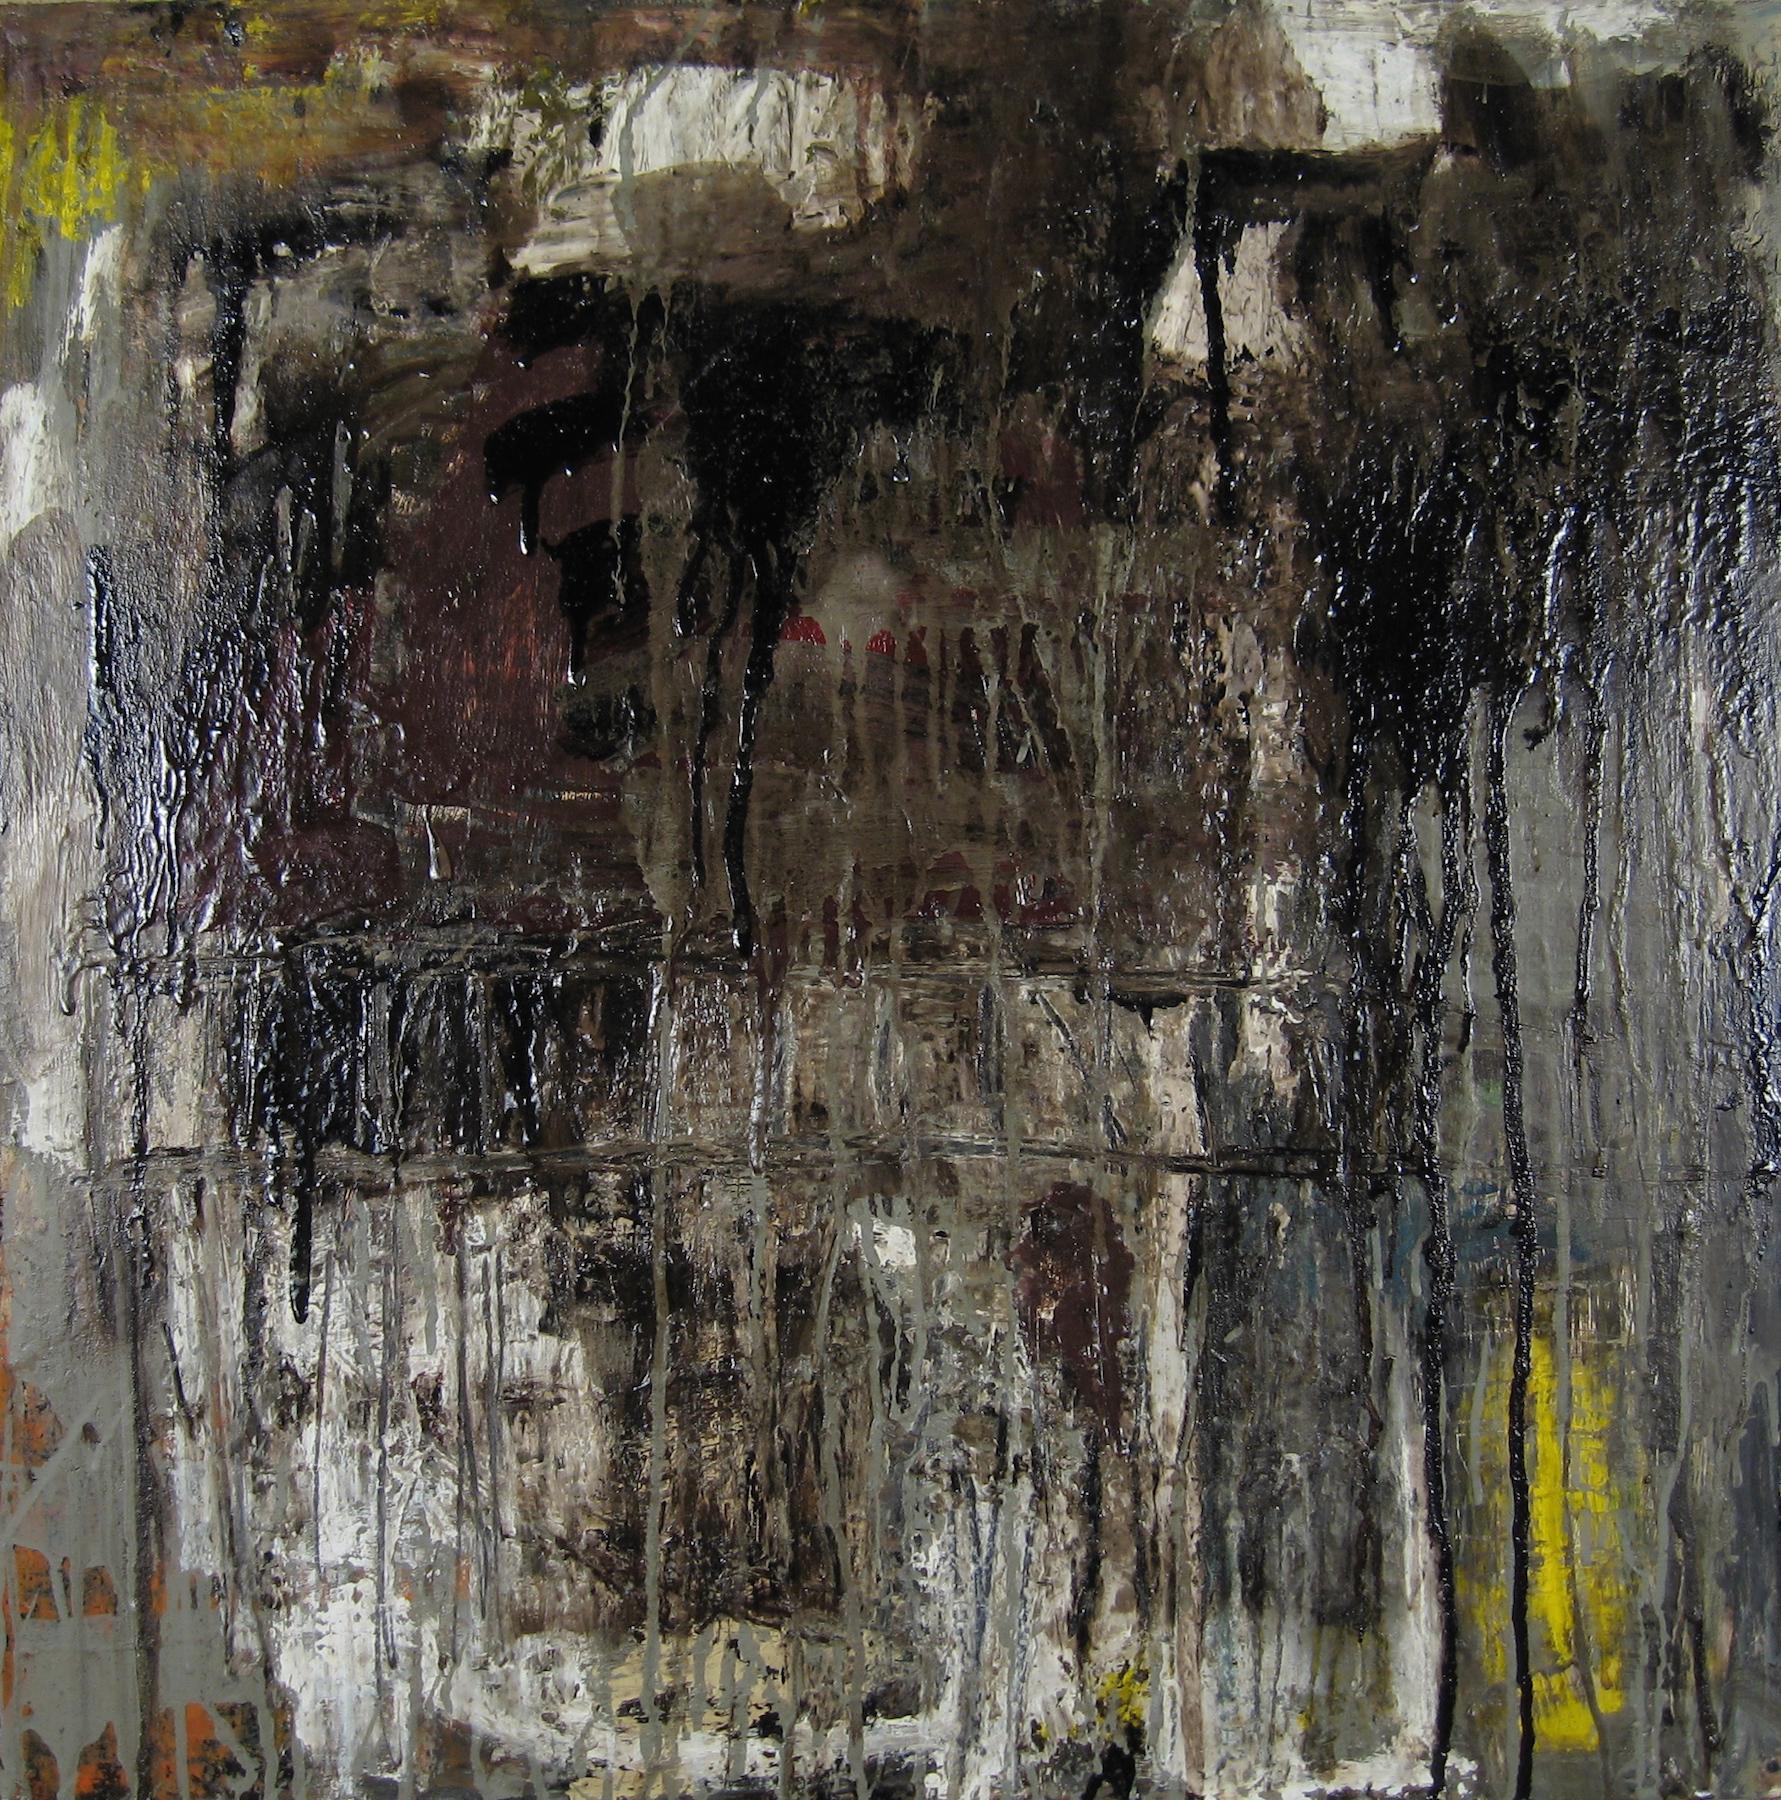 Leslie Zelamsky, Ayeka III: Where Are You?, mixed media, 24x24, $1,500